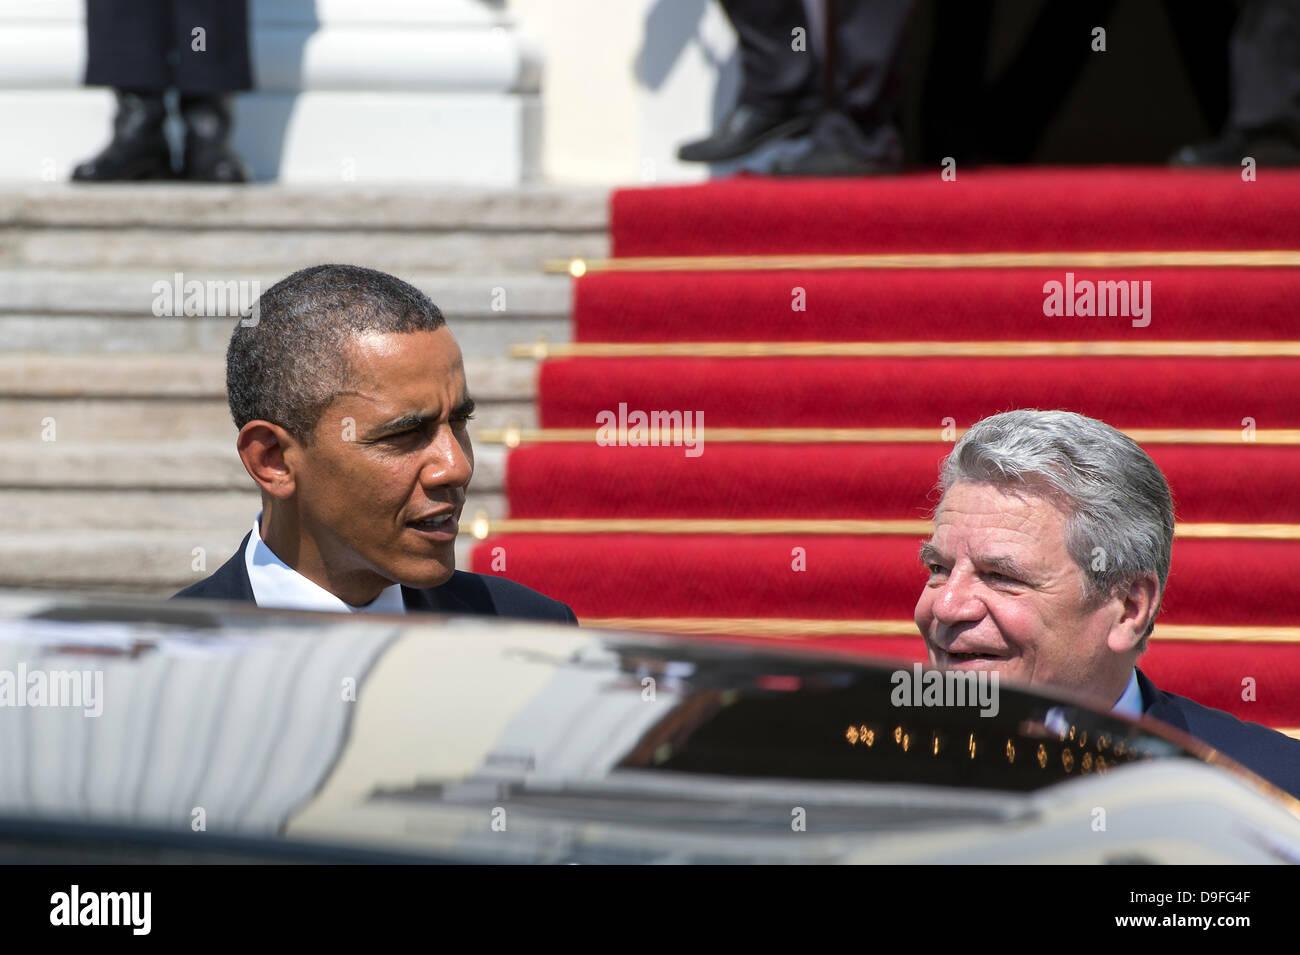 Berlin, Germany. June 19th 2013. German President Joaquim Gauck receives US President Barack Obama in the Presidential Stock Photo